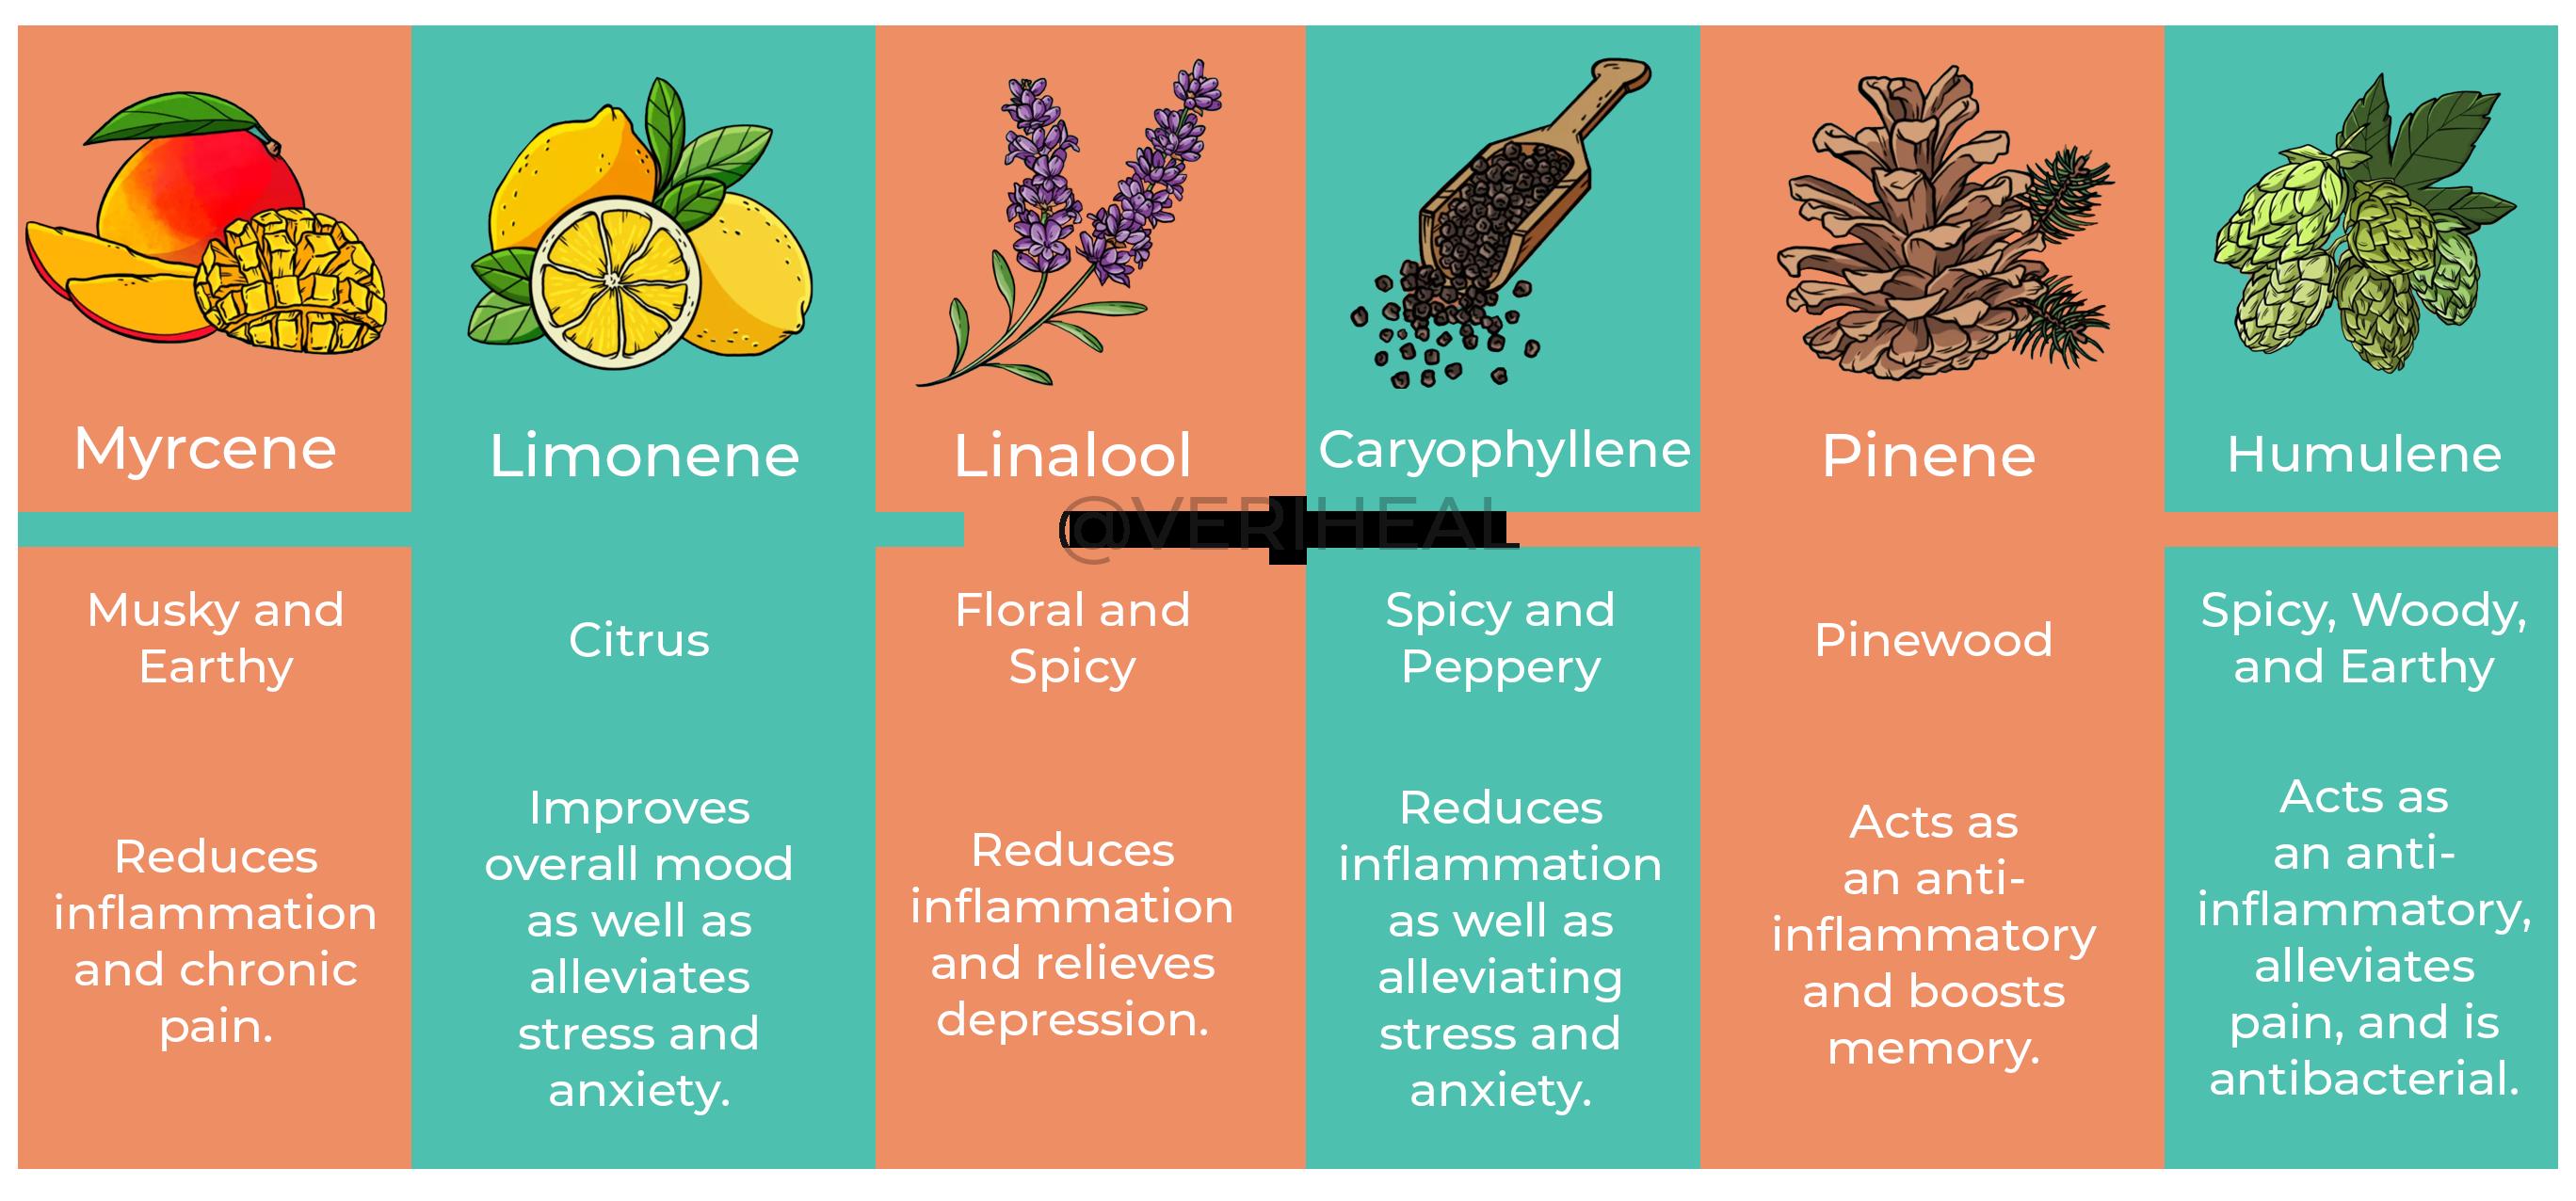 Veriheal Terpene Infographic